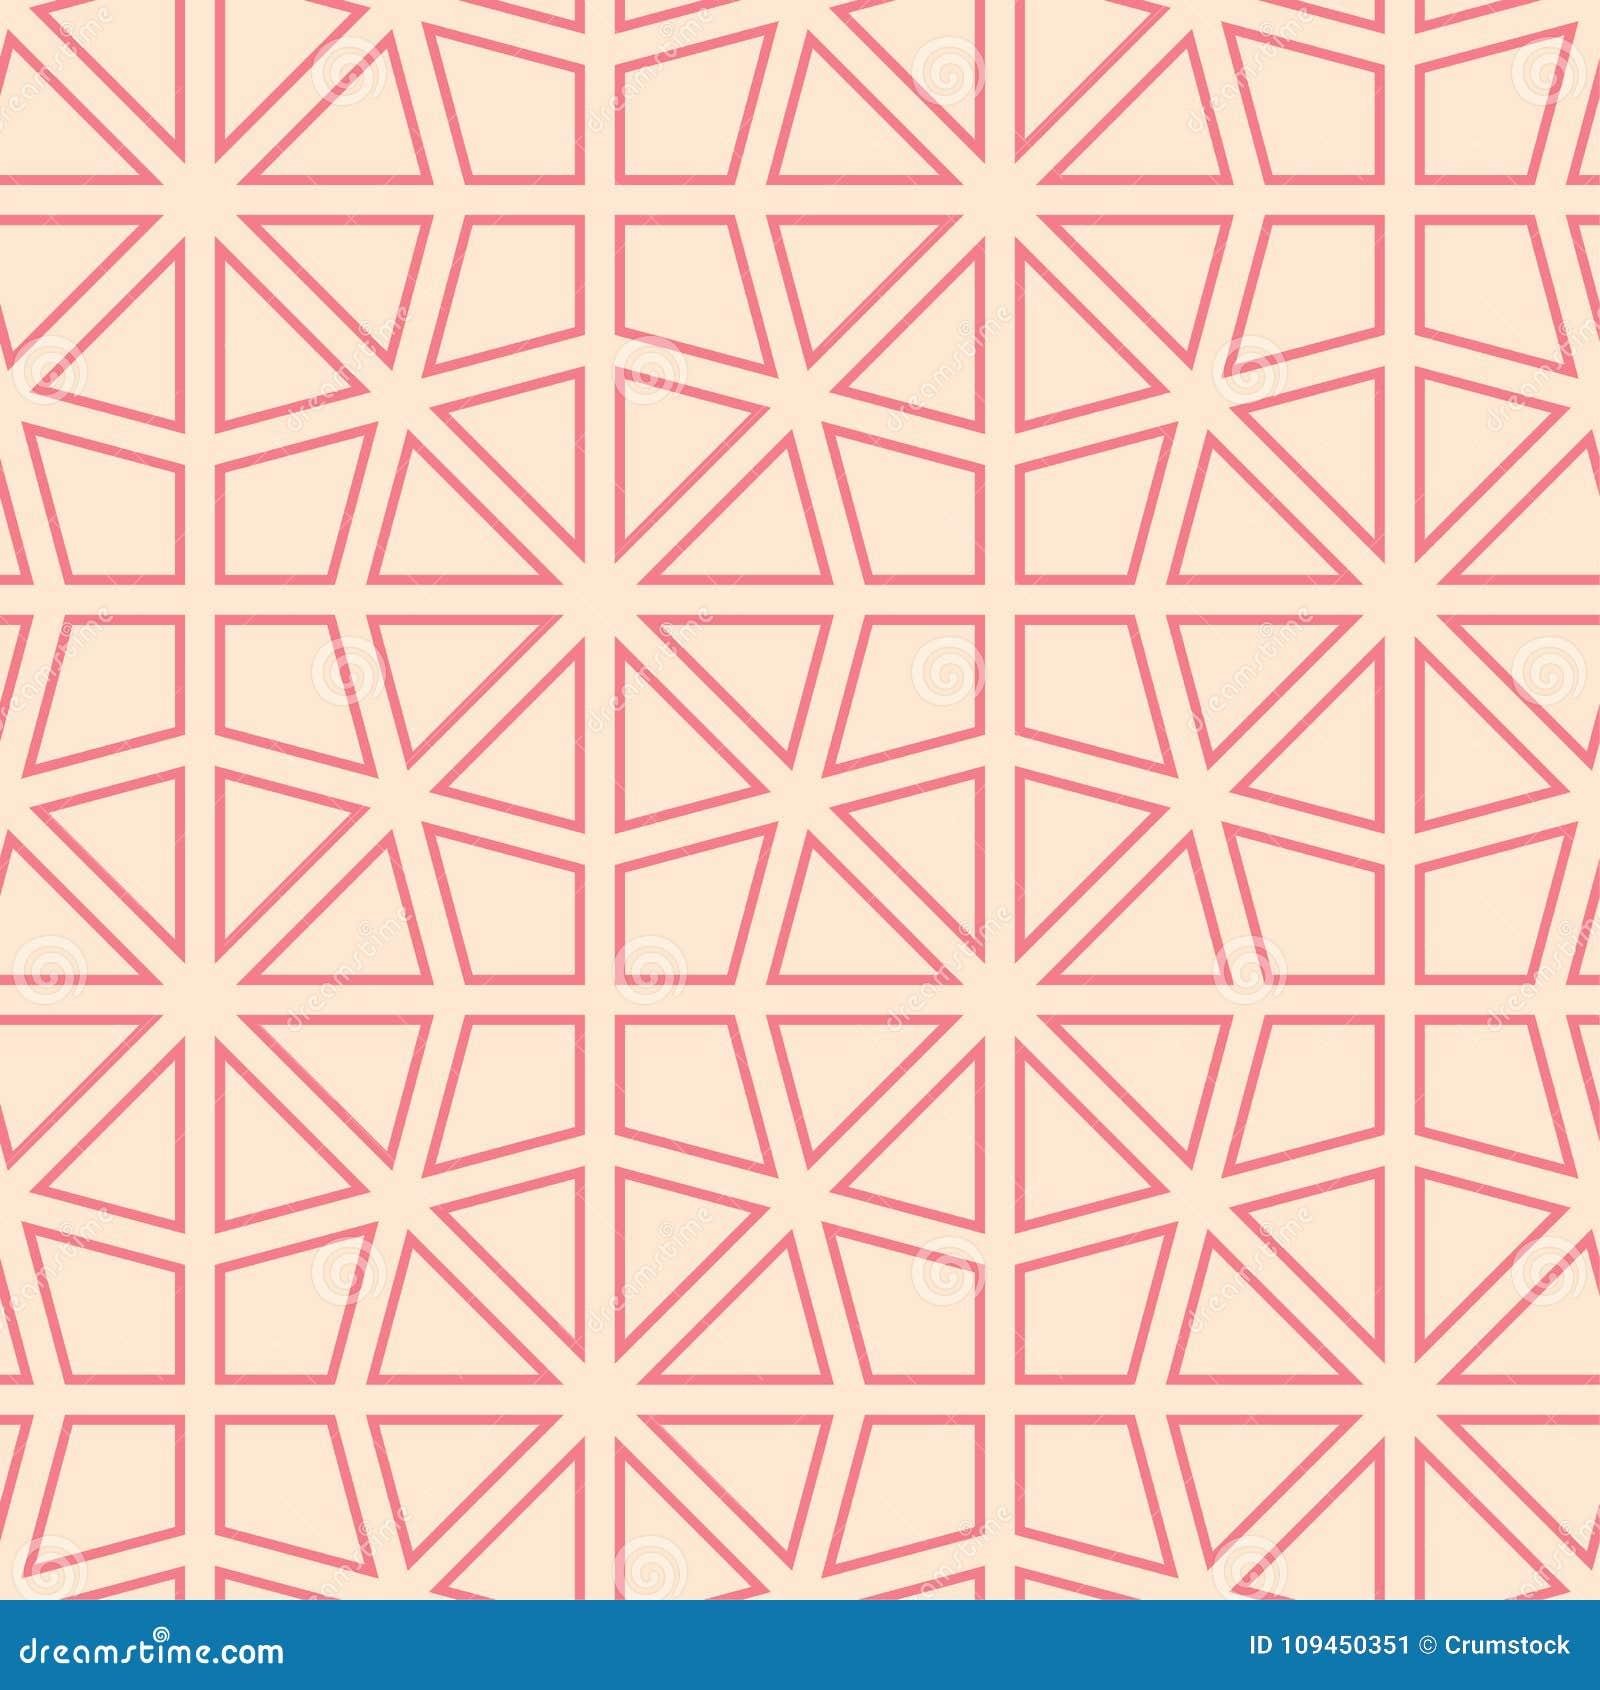 Пинк и бежевый геометрический орнамент картина безшовная